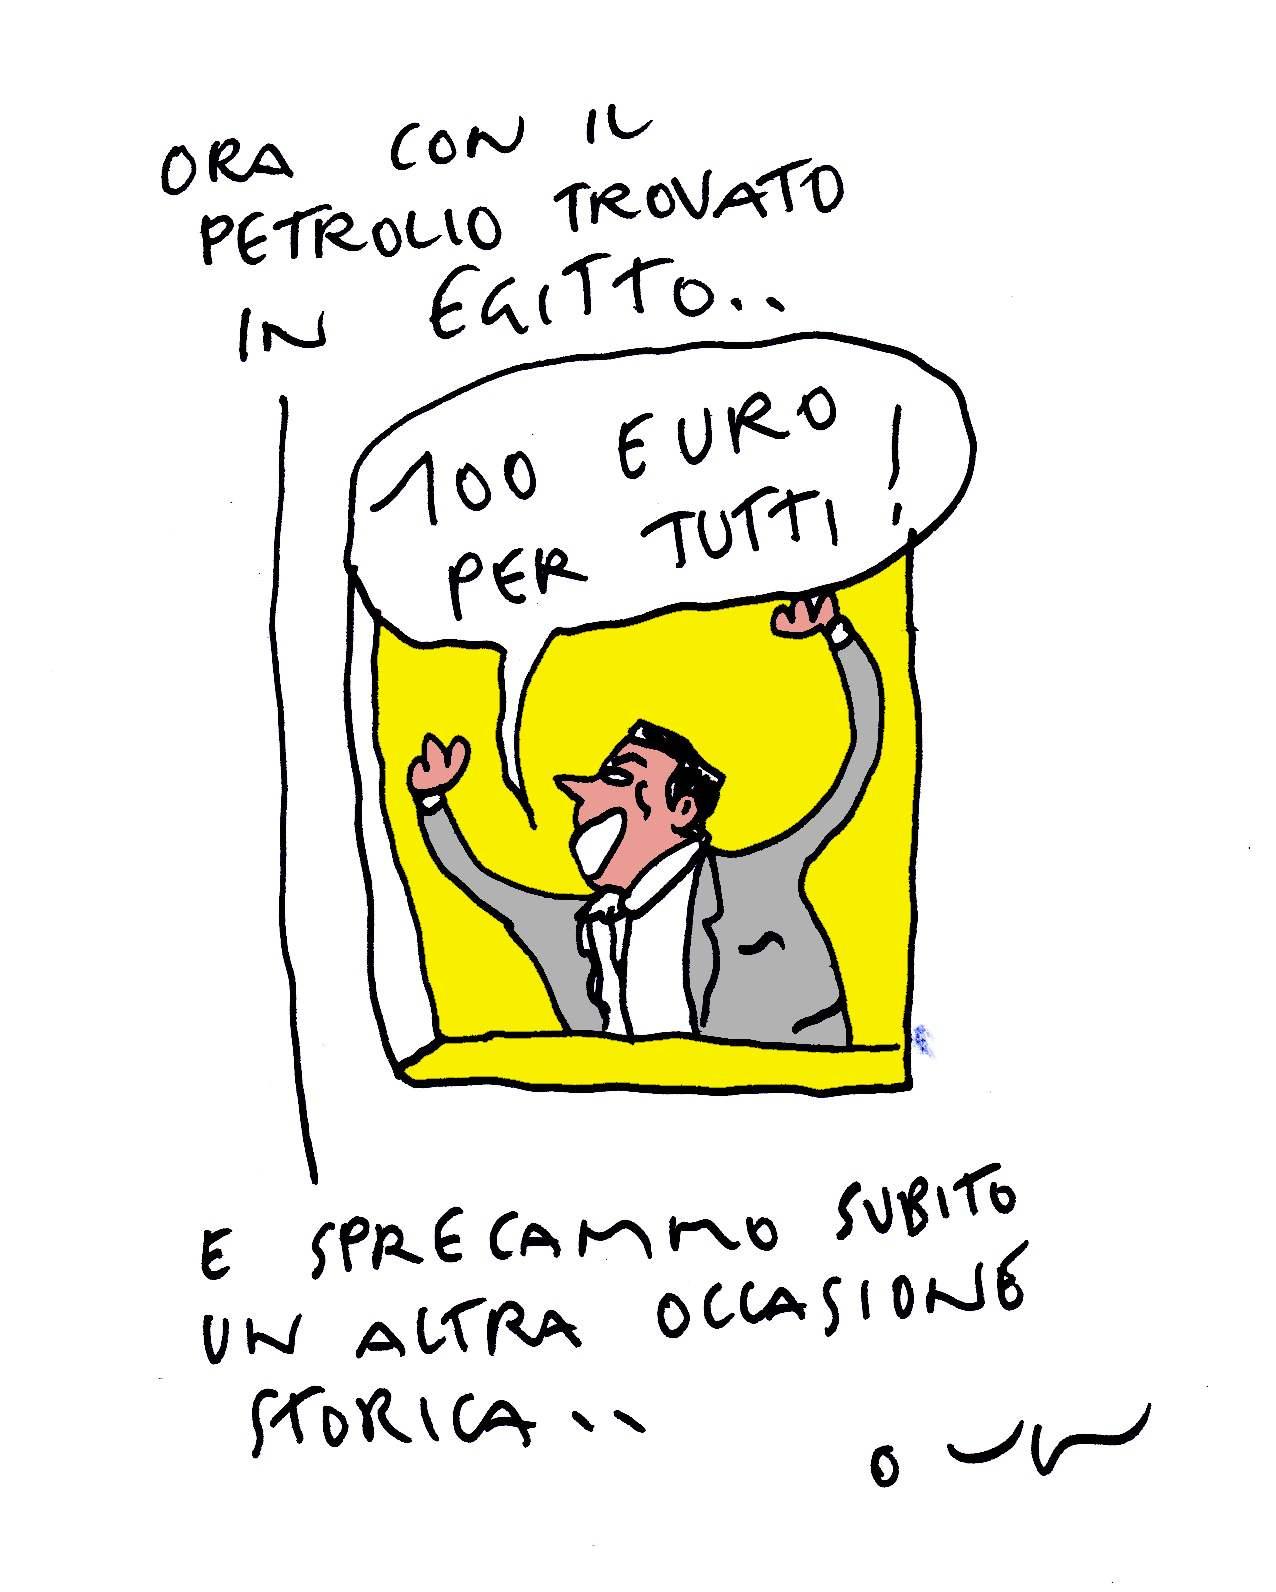 100 euri petrolio egittok